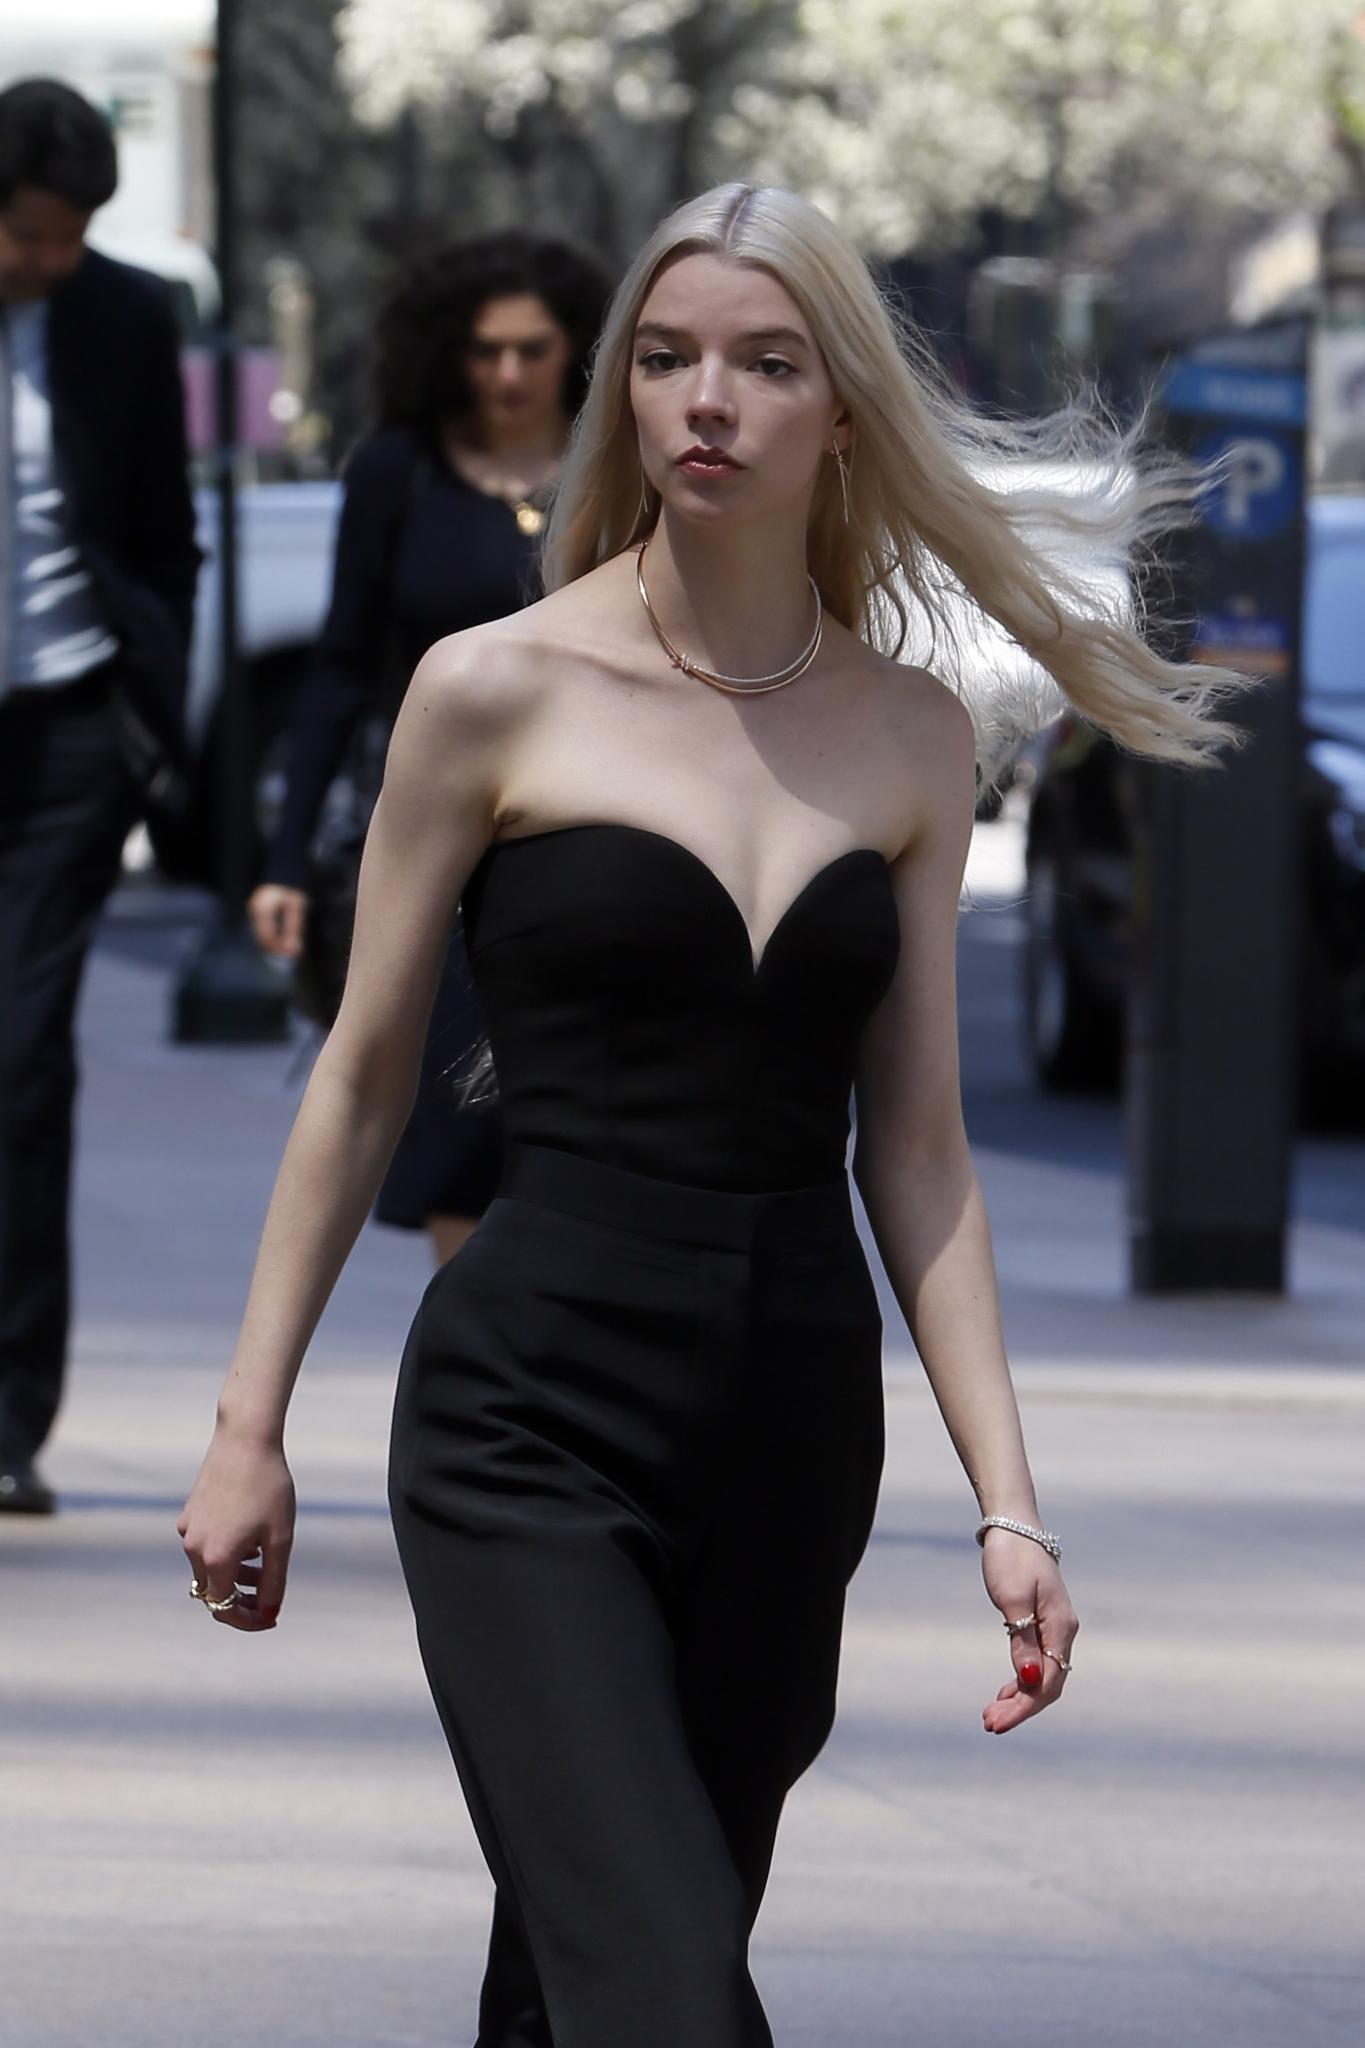 Anya Taylor-Joy shooting for Tiffany in New York City.